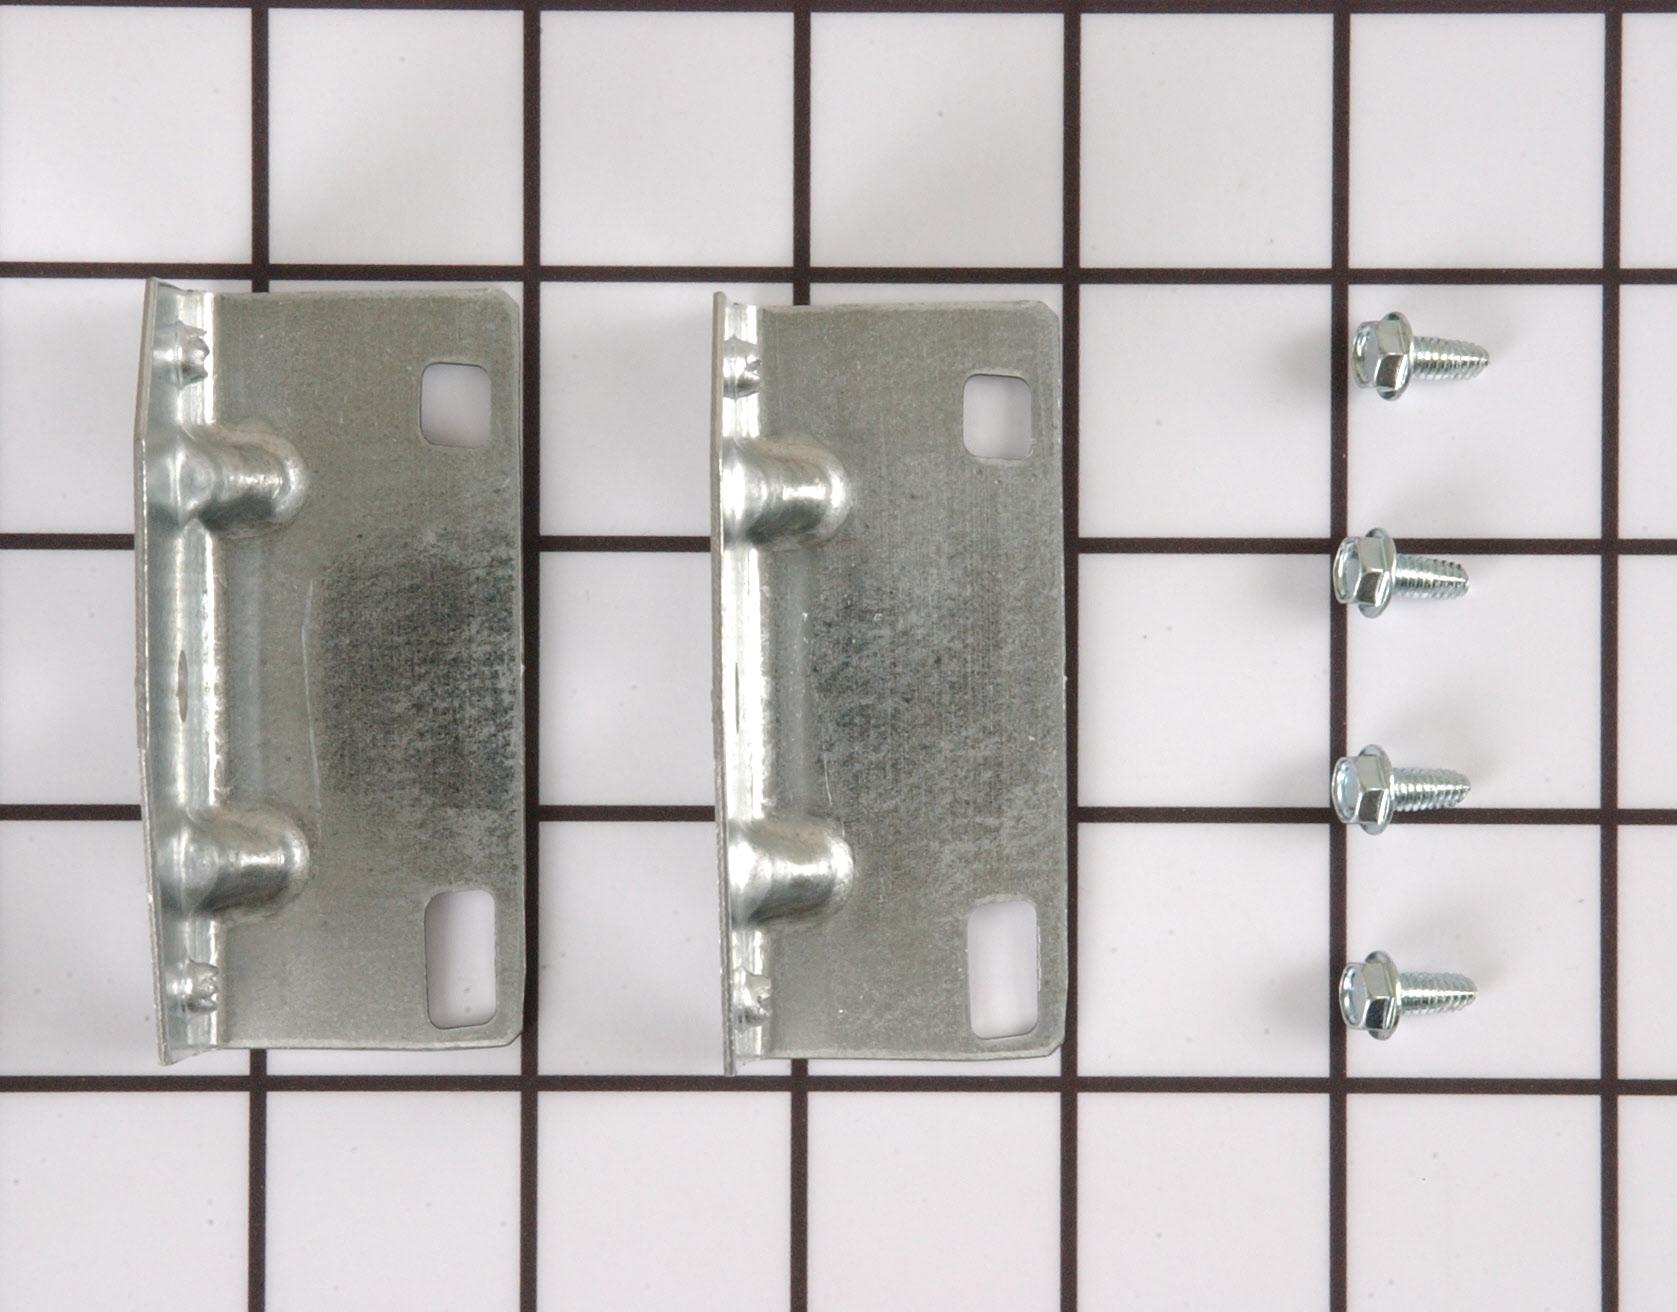 12002090 Speed Queen Dryer Part -Bracket Kit